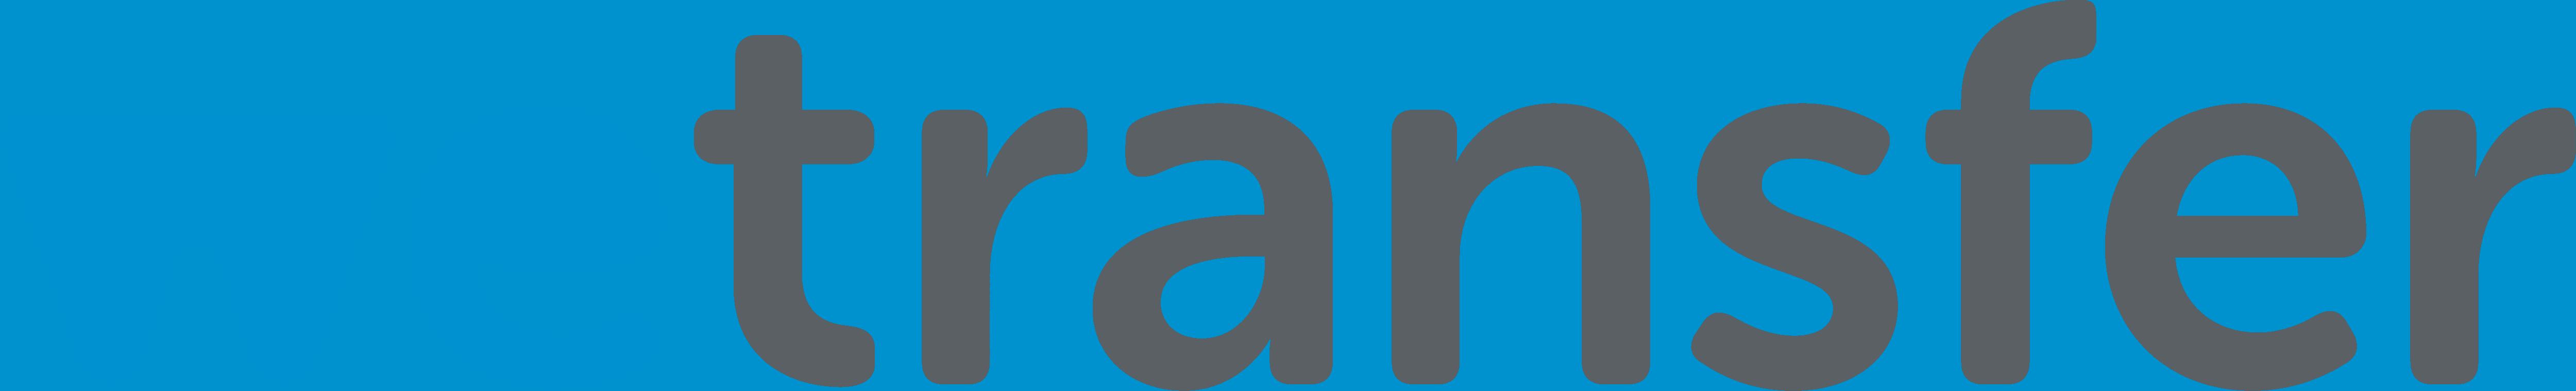 wetransfer_logo_we_transfer